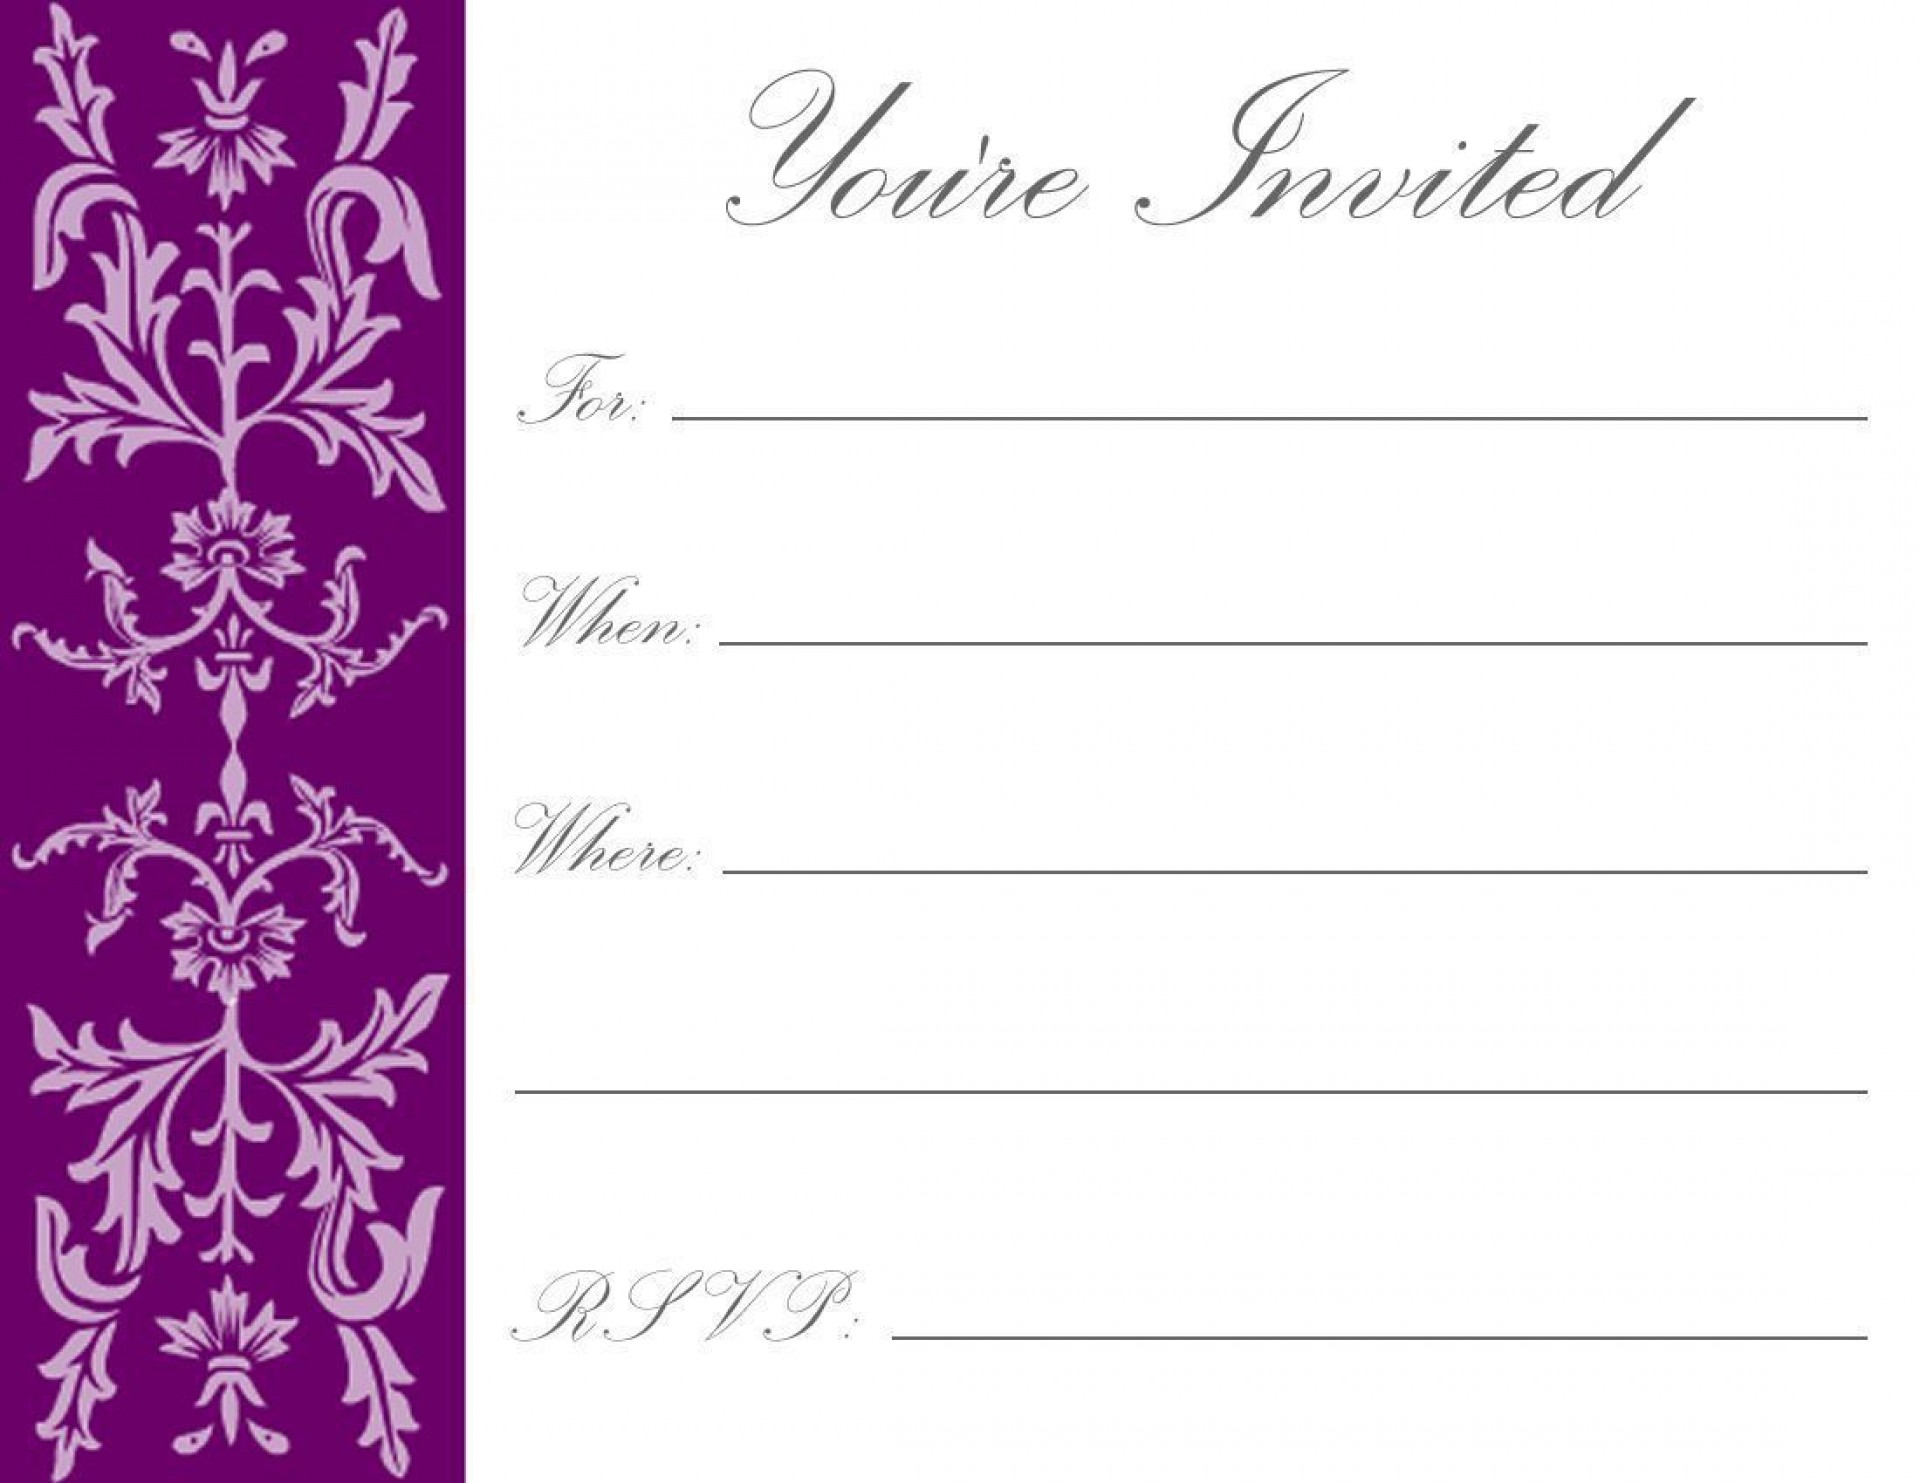 004 Rare Free Online Birthday Invitation Maker Printable Photo  1st Card1920